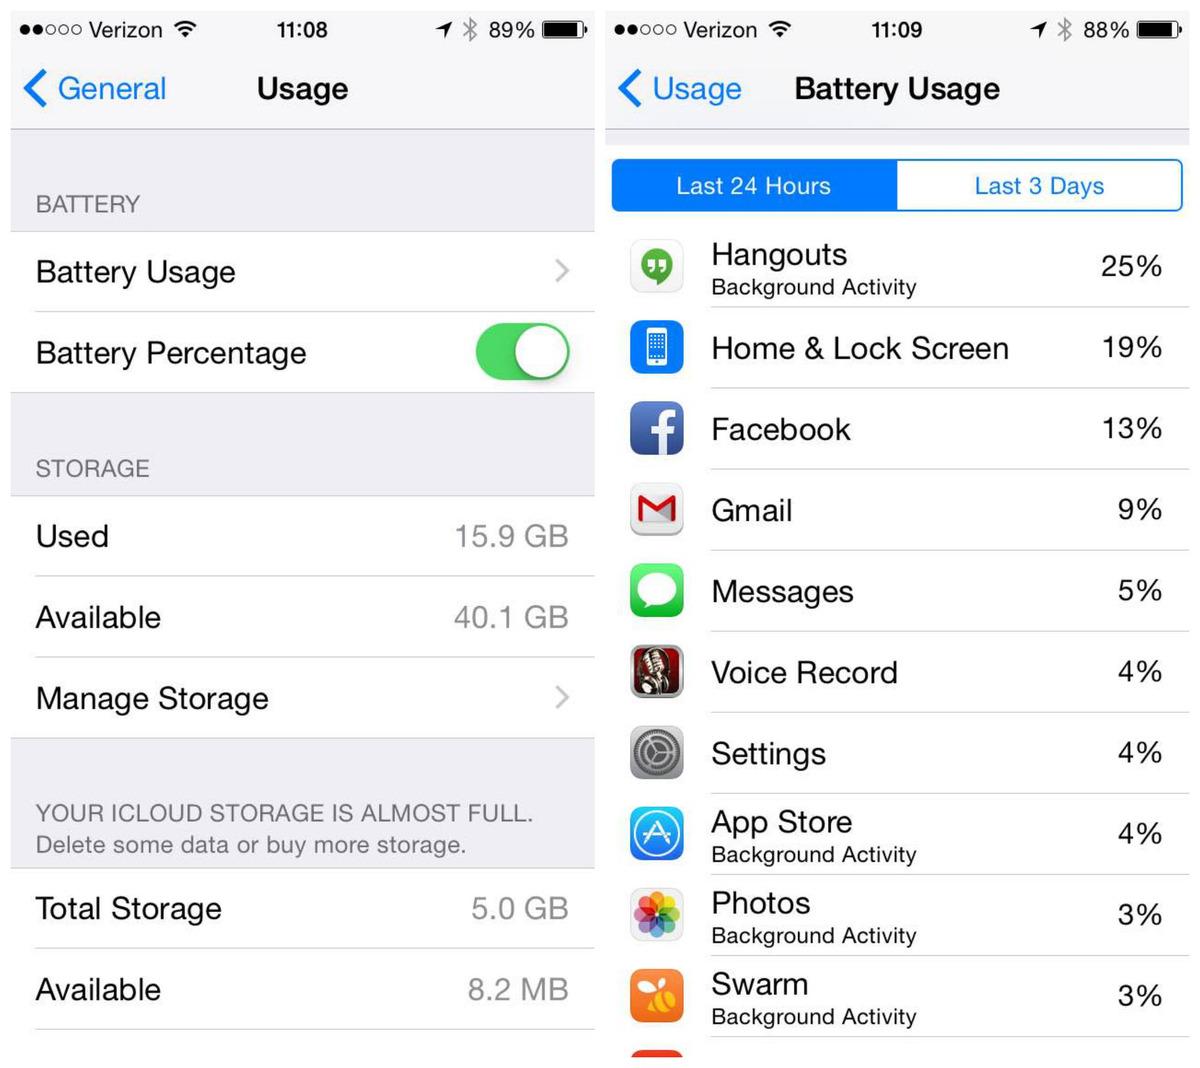 iOS 8 battery usage statistics